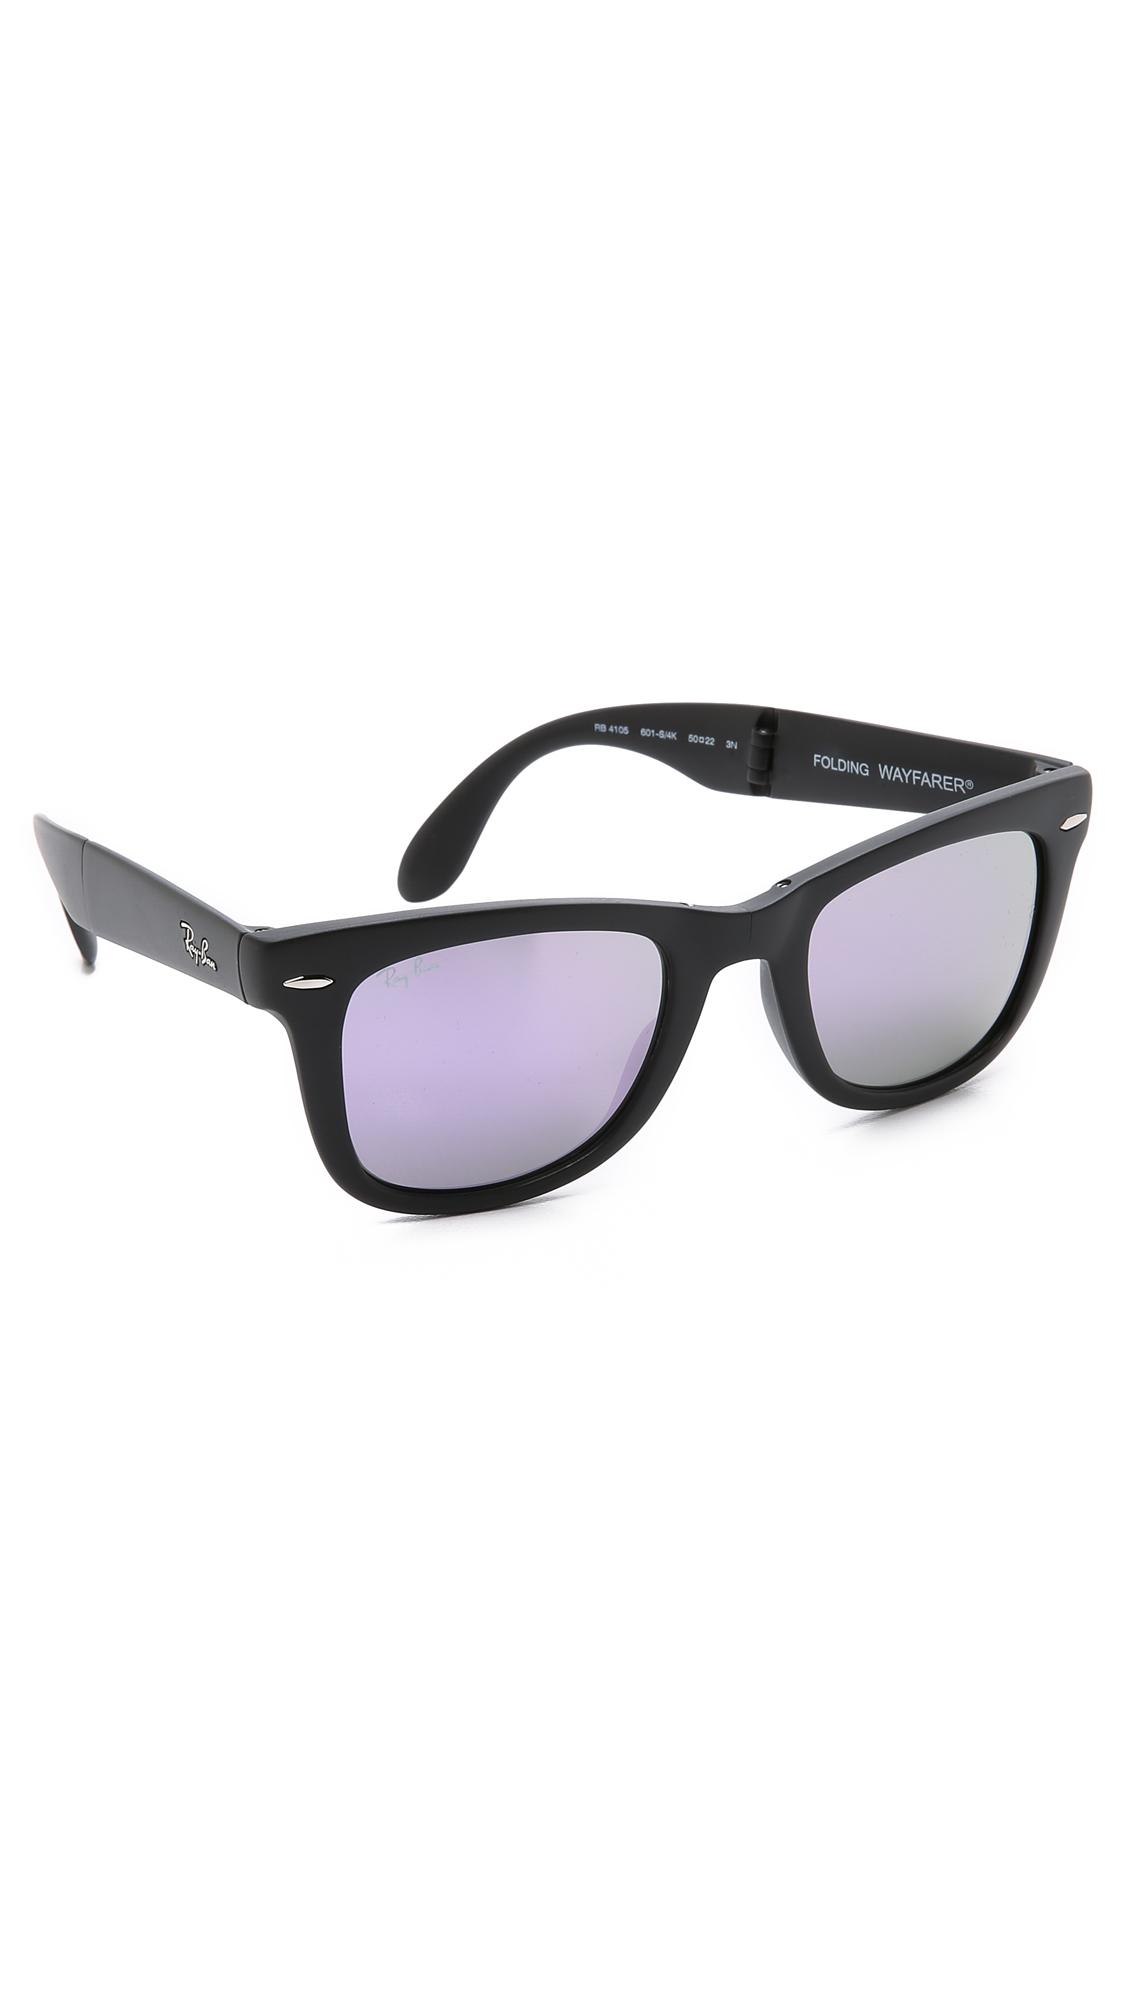 1af673181ce Lyst - Ray-Ban Folding Wayfarer Sunglasses With Flash Lens in Black ...